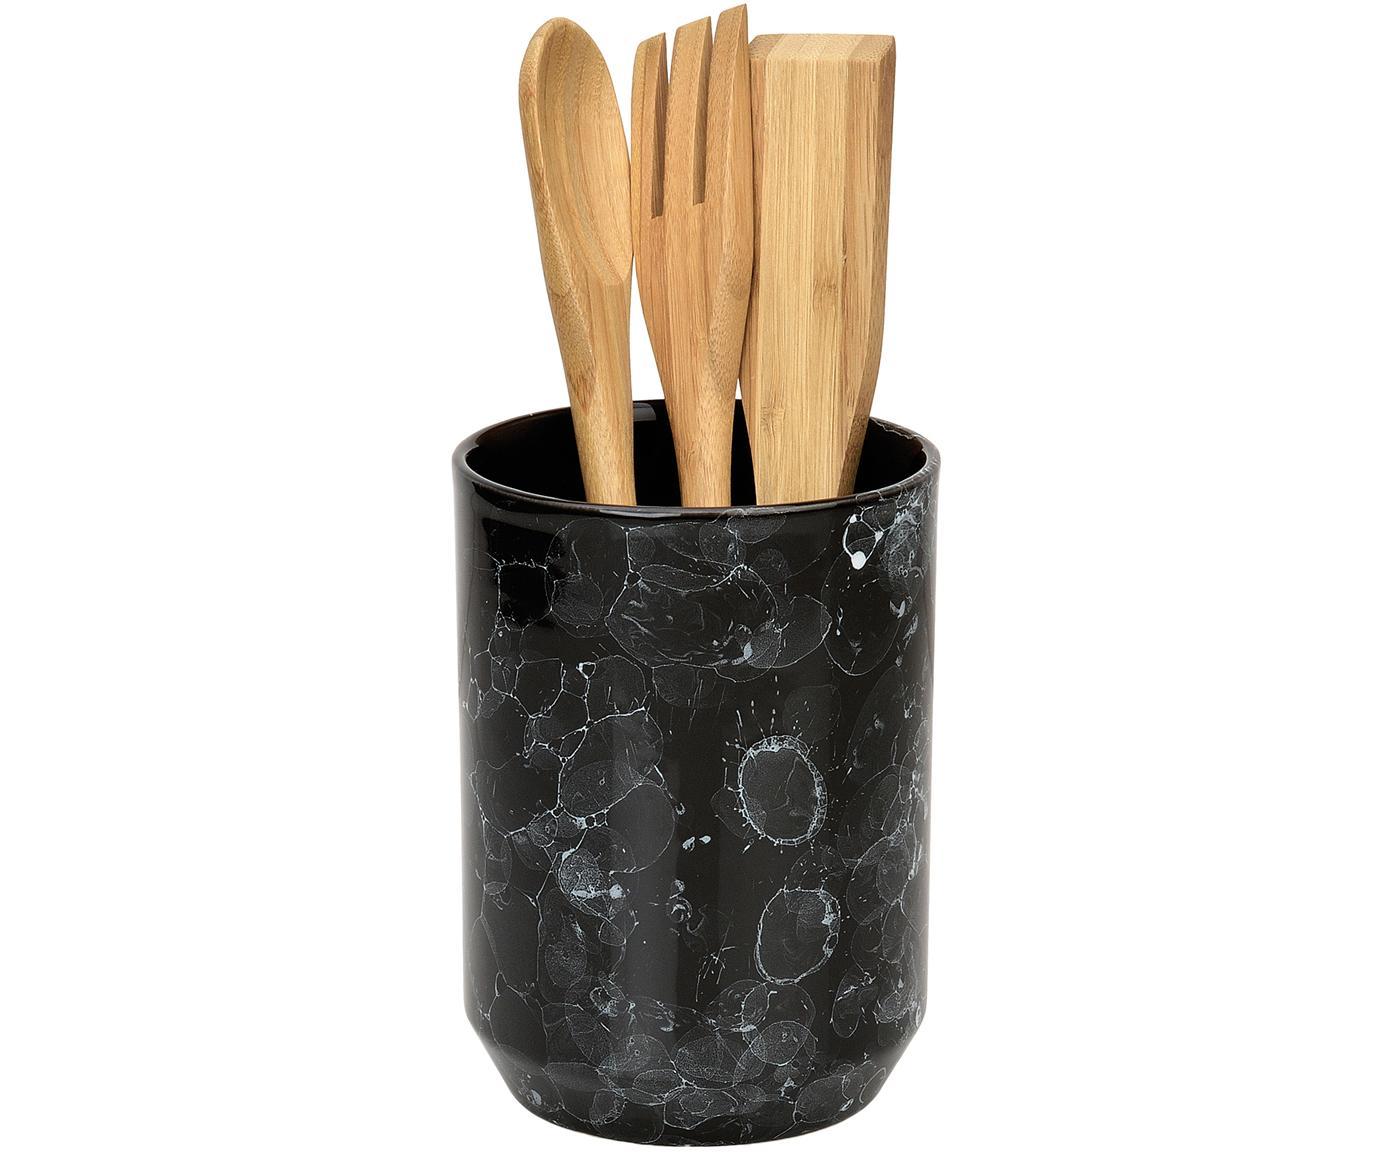 Küchenutensilien-Set Bubble in Marmor-Optik, 4-tlg., Küchenutensilienhalter: Keramik Küchenutensilien, Schwarz, Braun, Ø 11 x H 24 cm